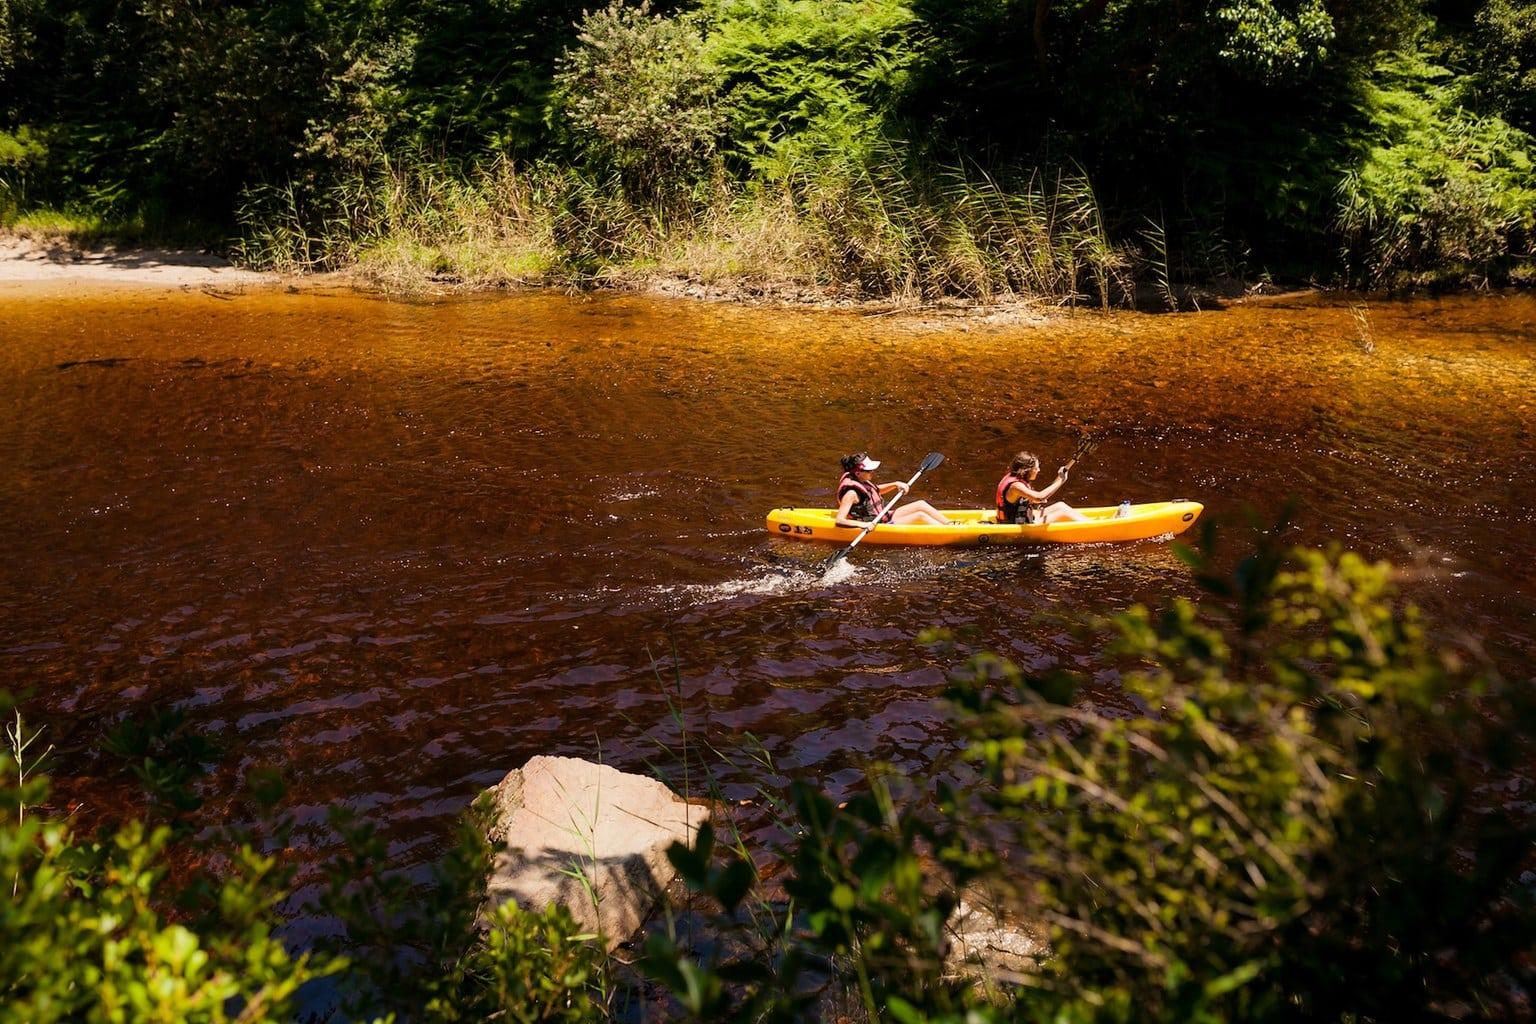 Kayaking in the Wilderness